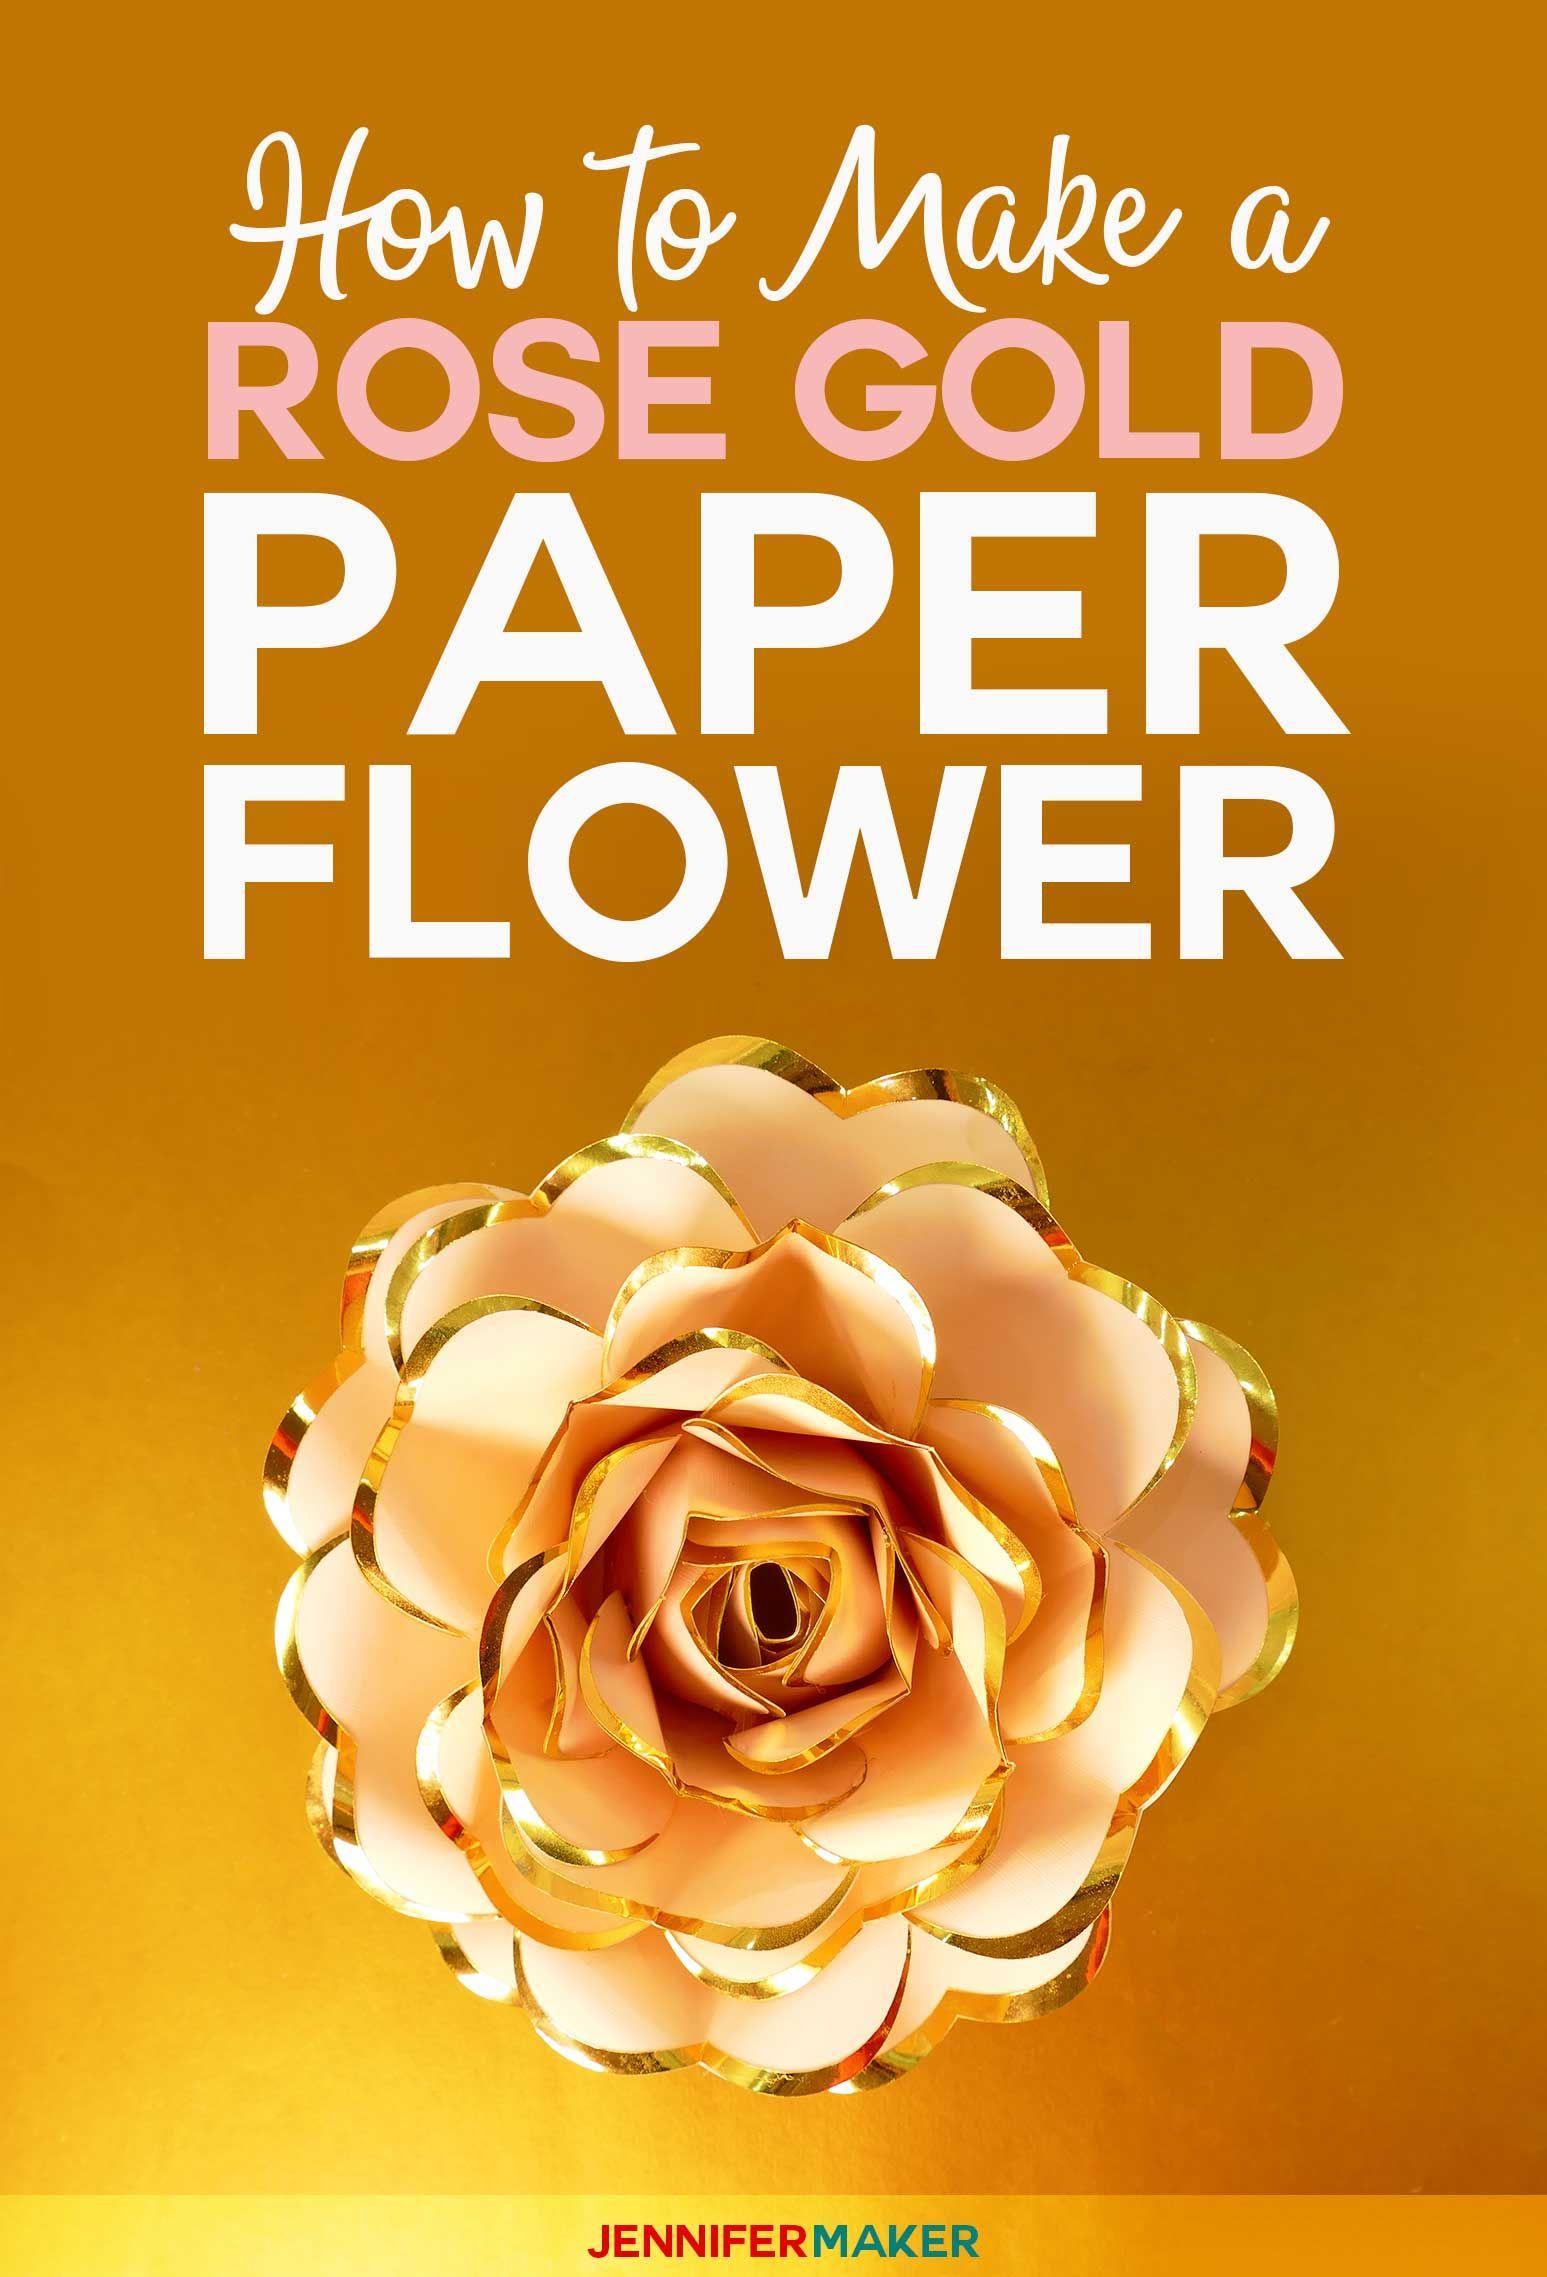 Rose Gold Paper Flower Foil Edged HeartShaped Petals